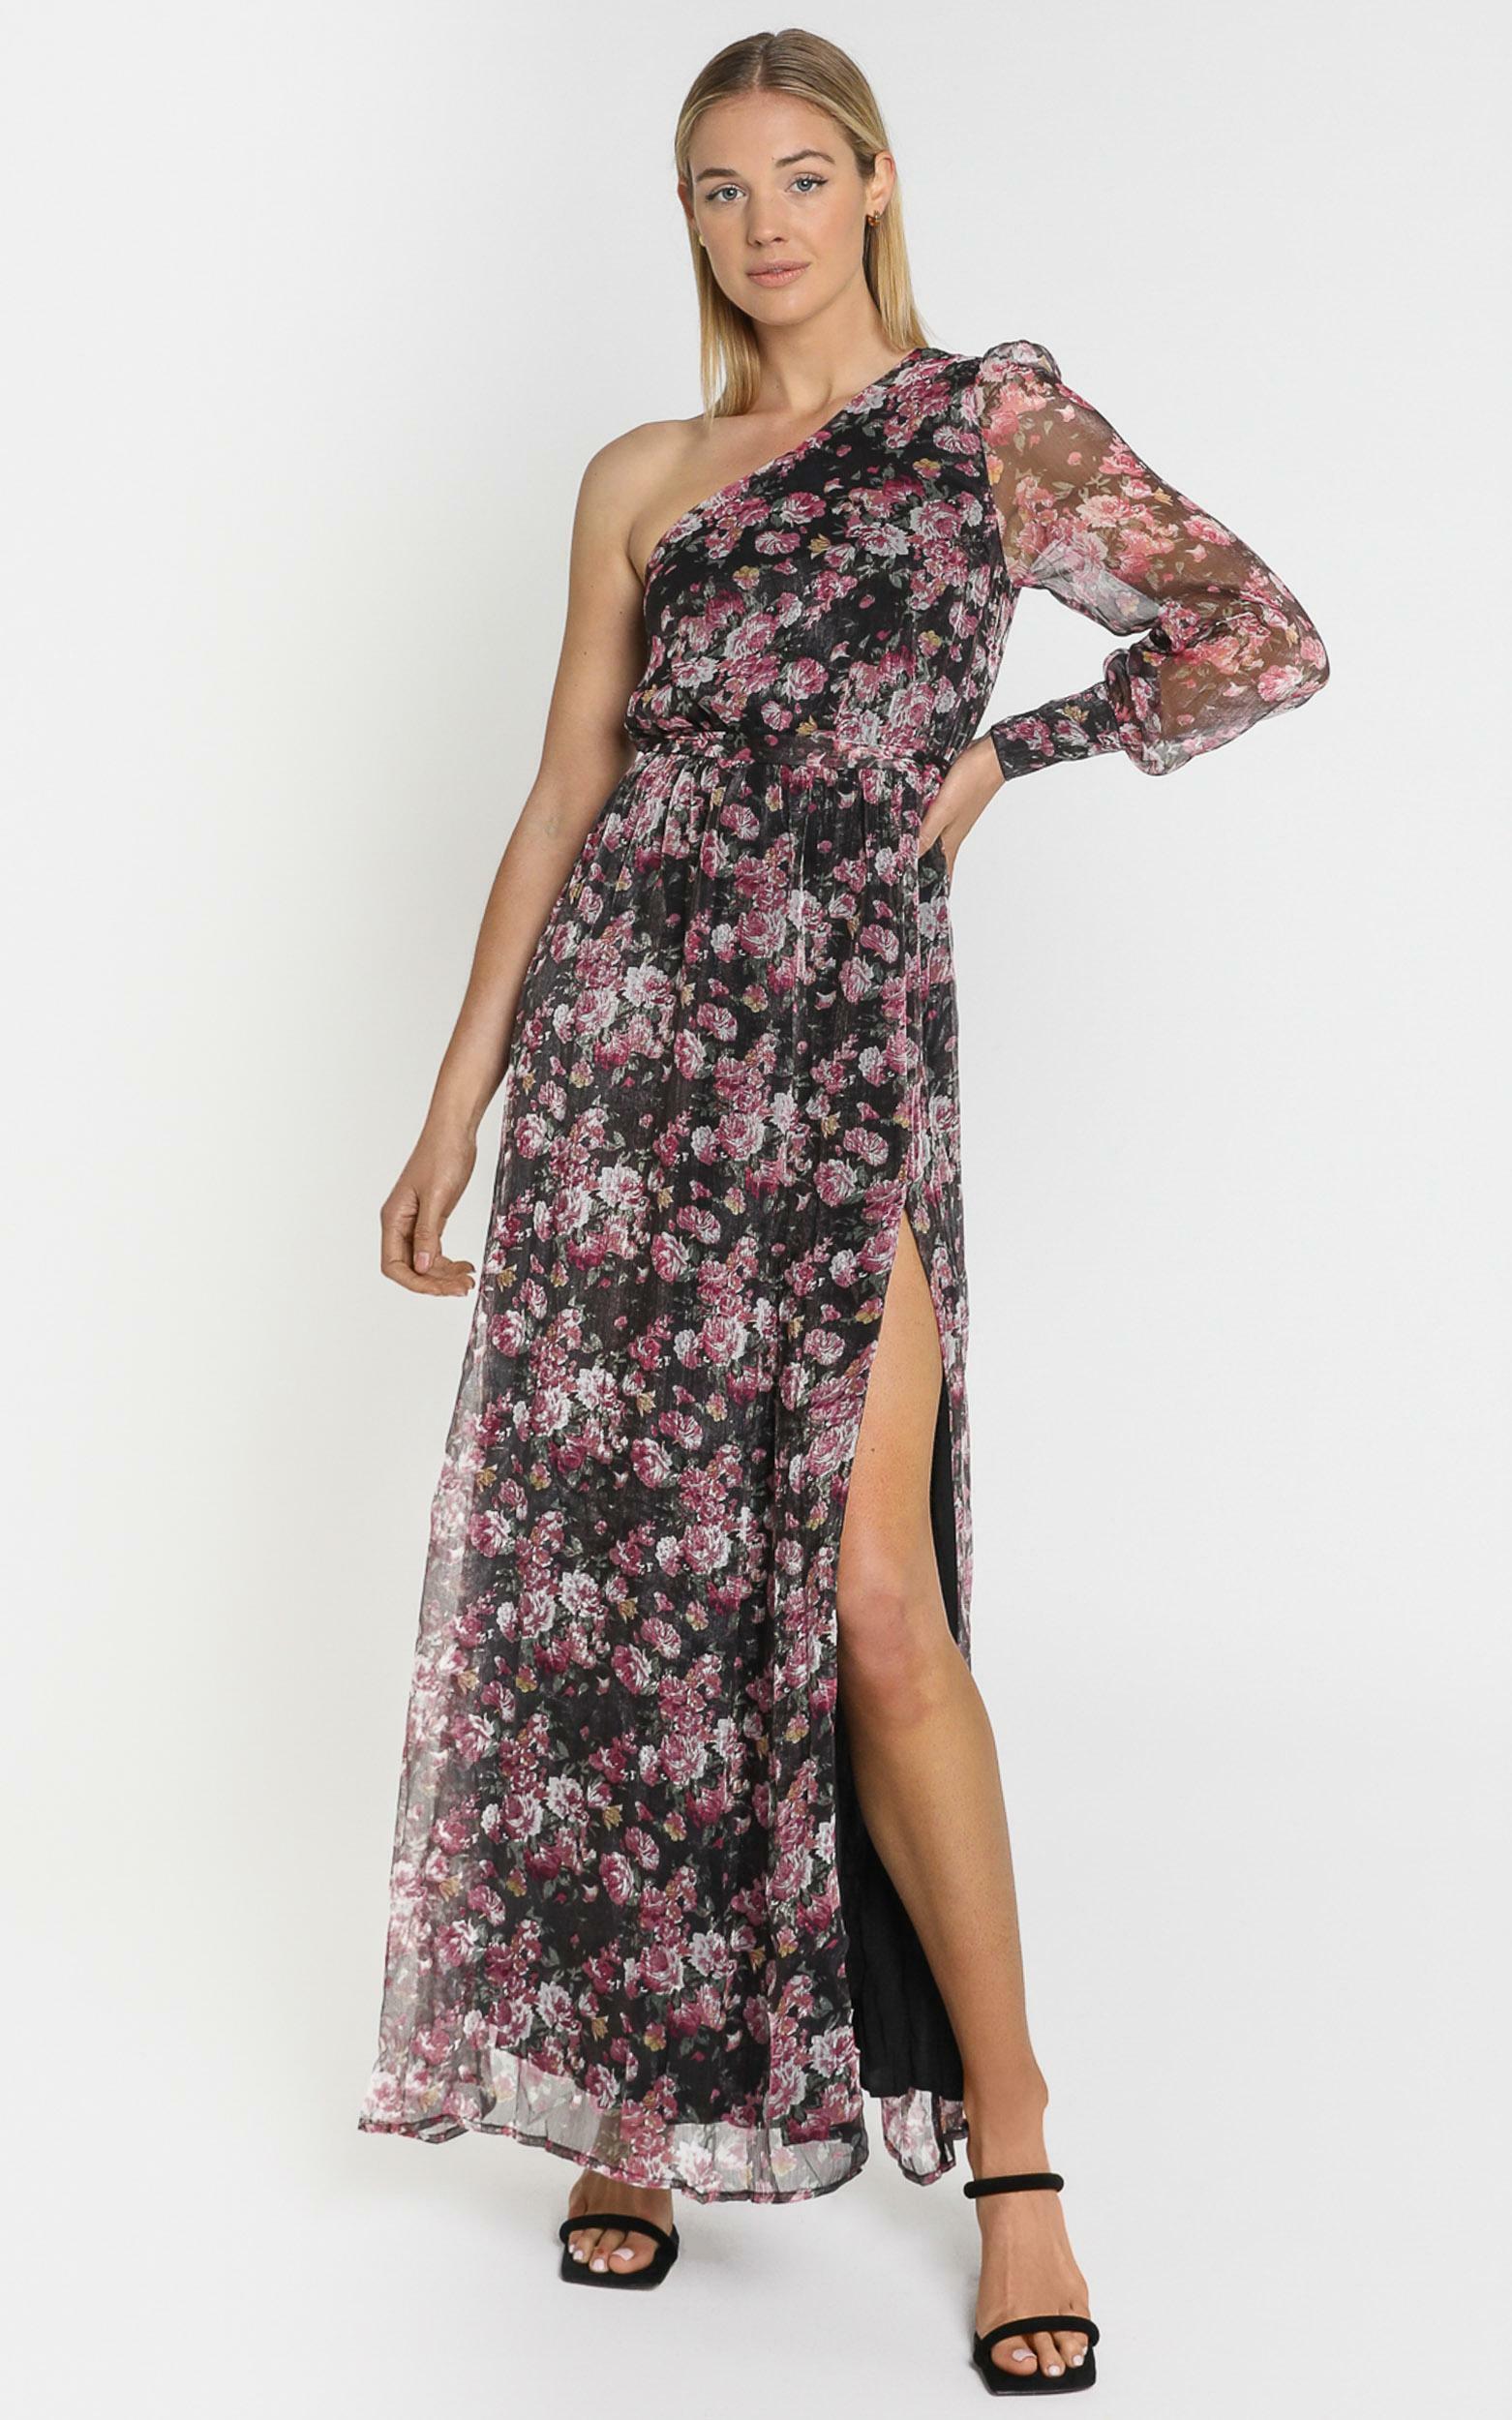 Leona One Shoulder Maxi Dress In romantic black floral - 4 (XXS), Black, hi-res image number null